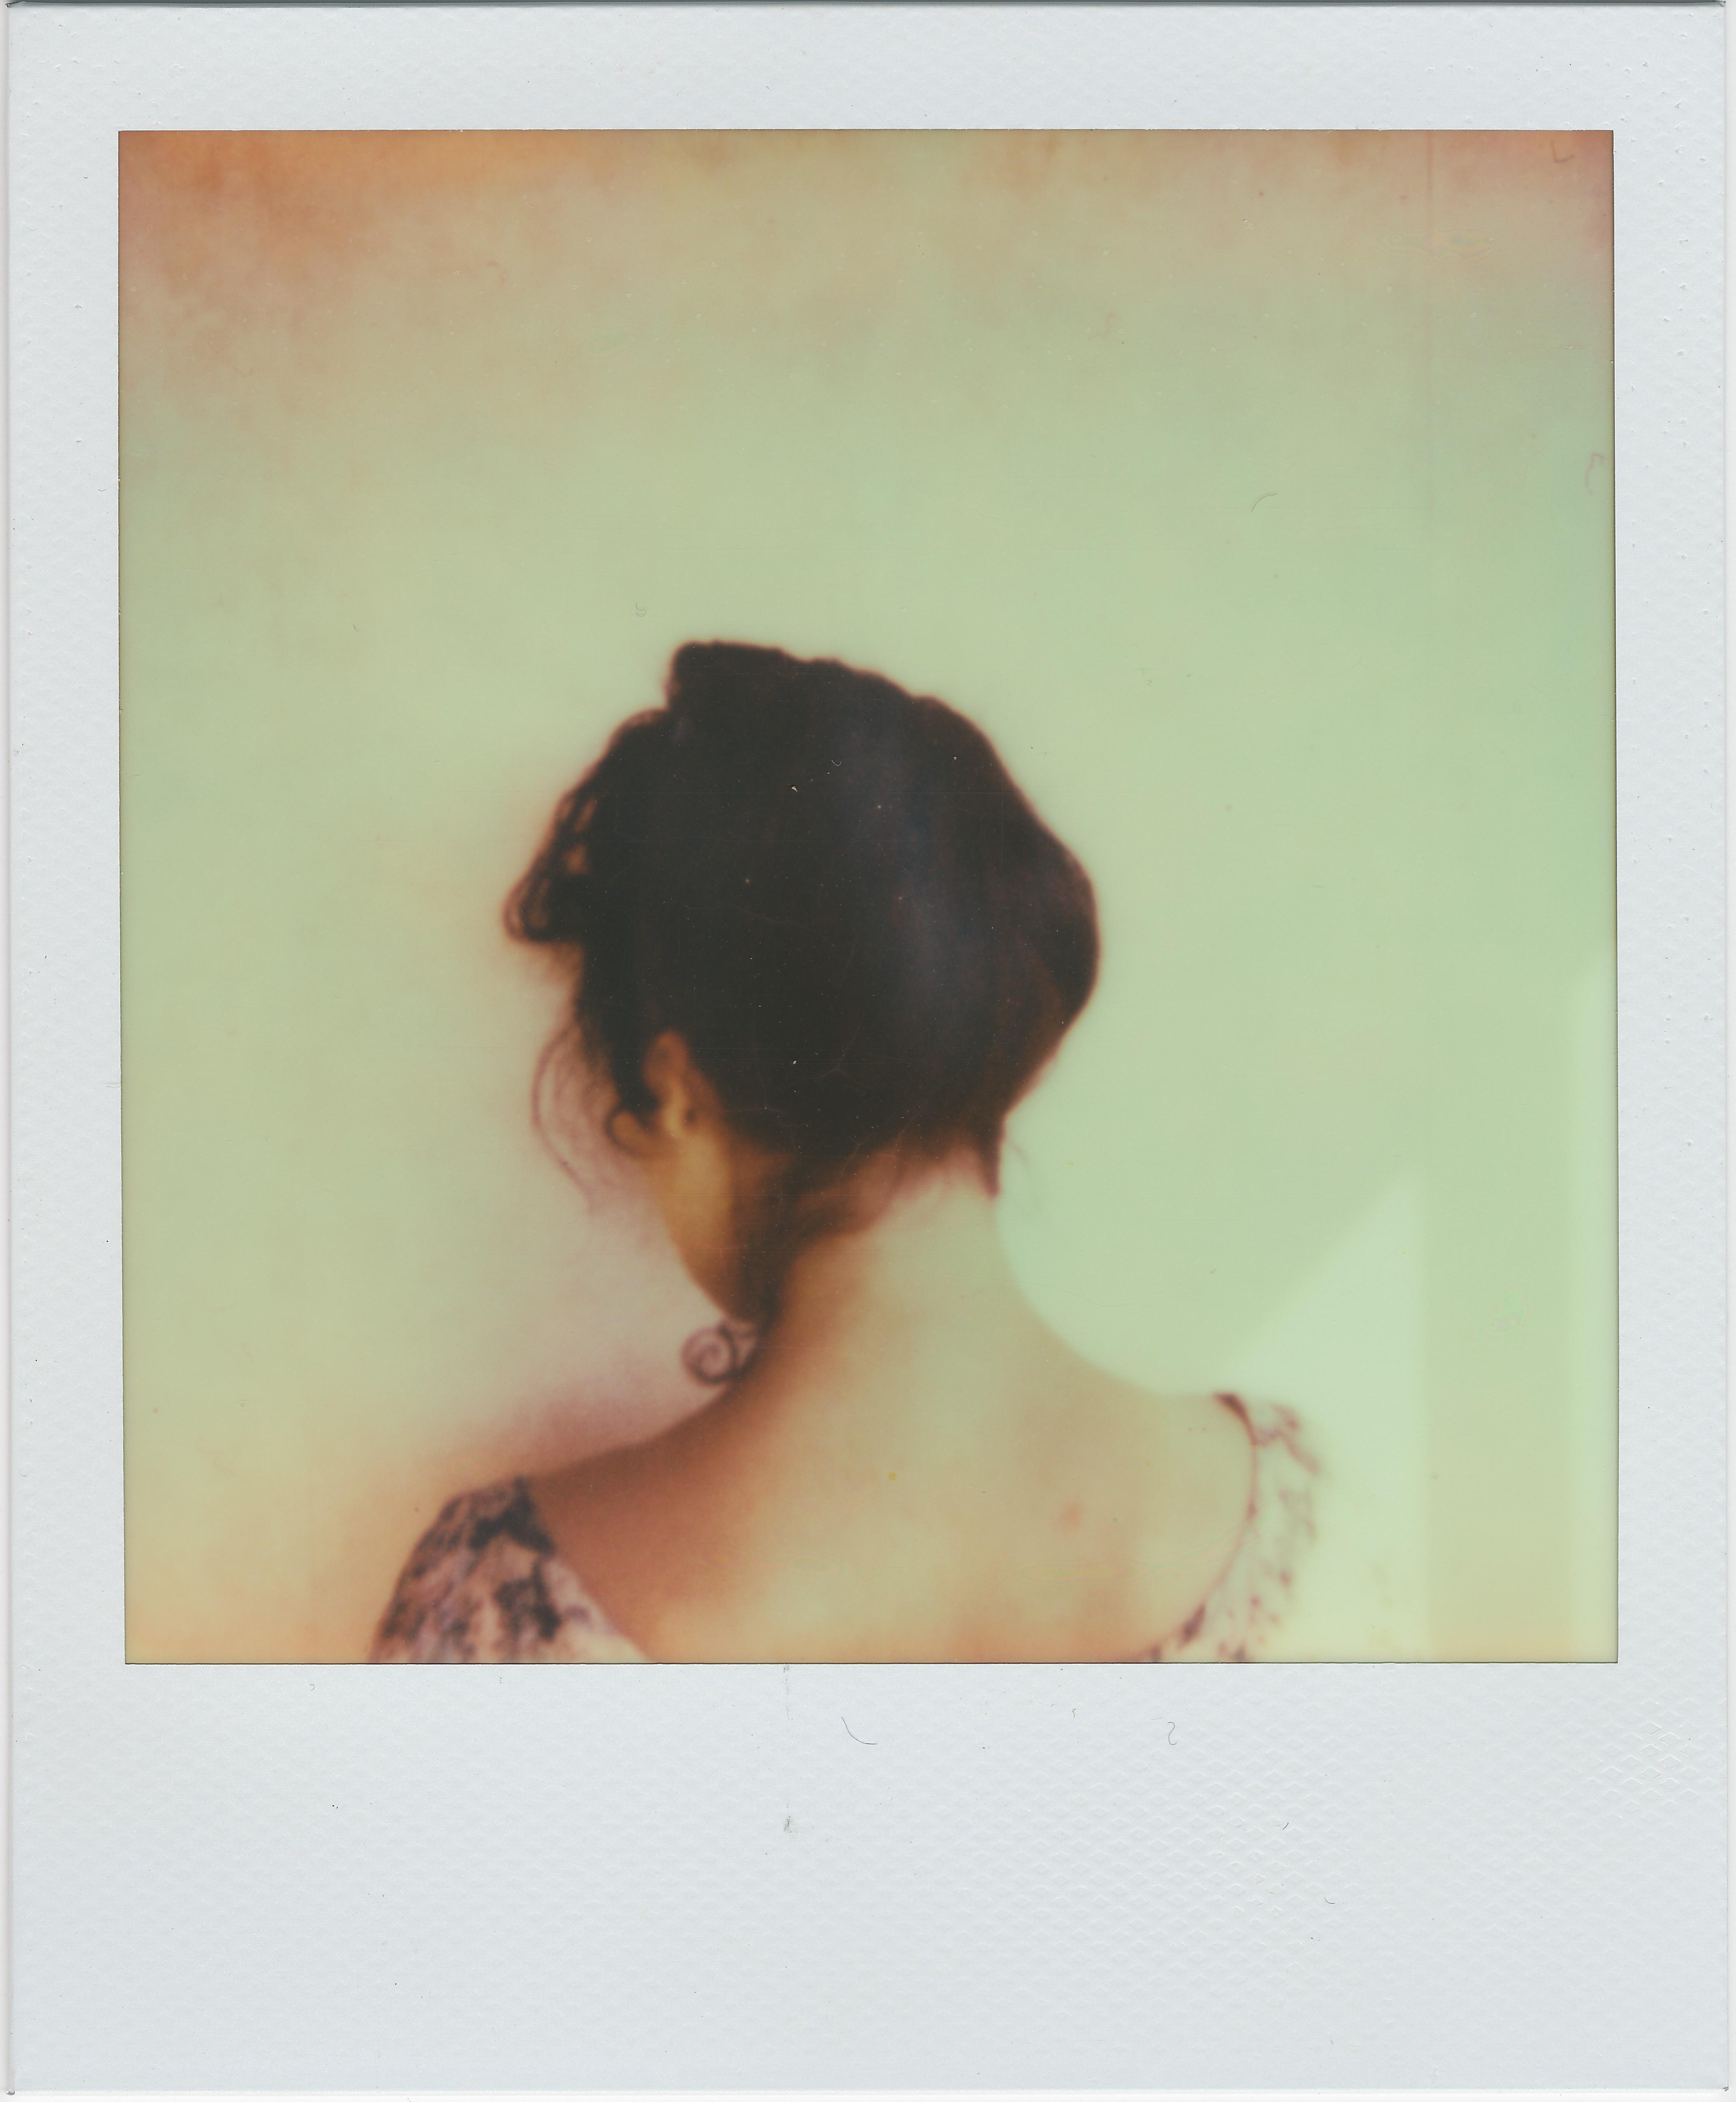 Celeste Ortiz Photo